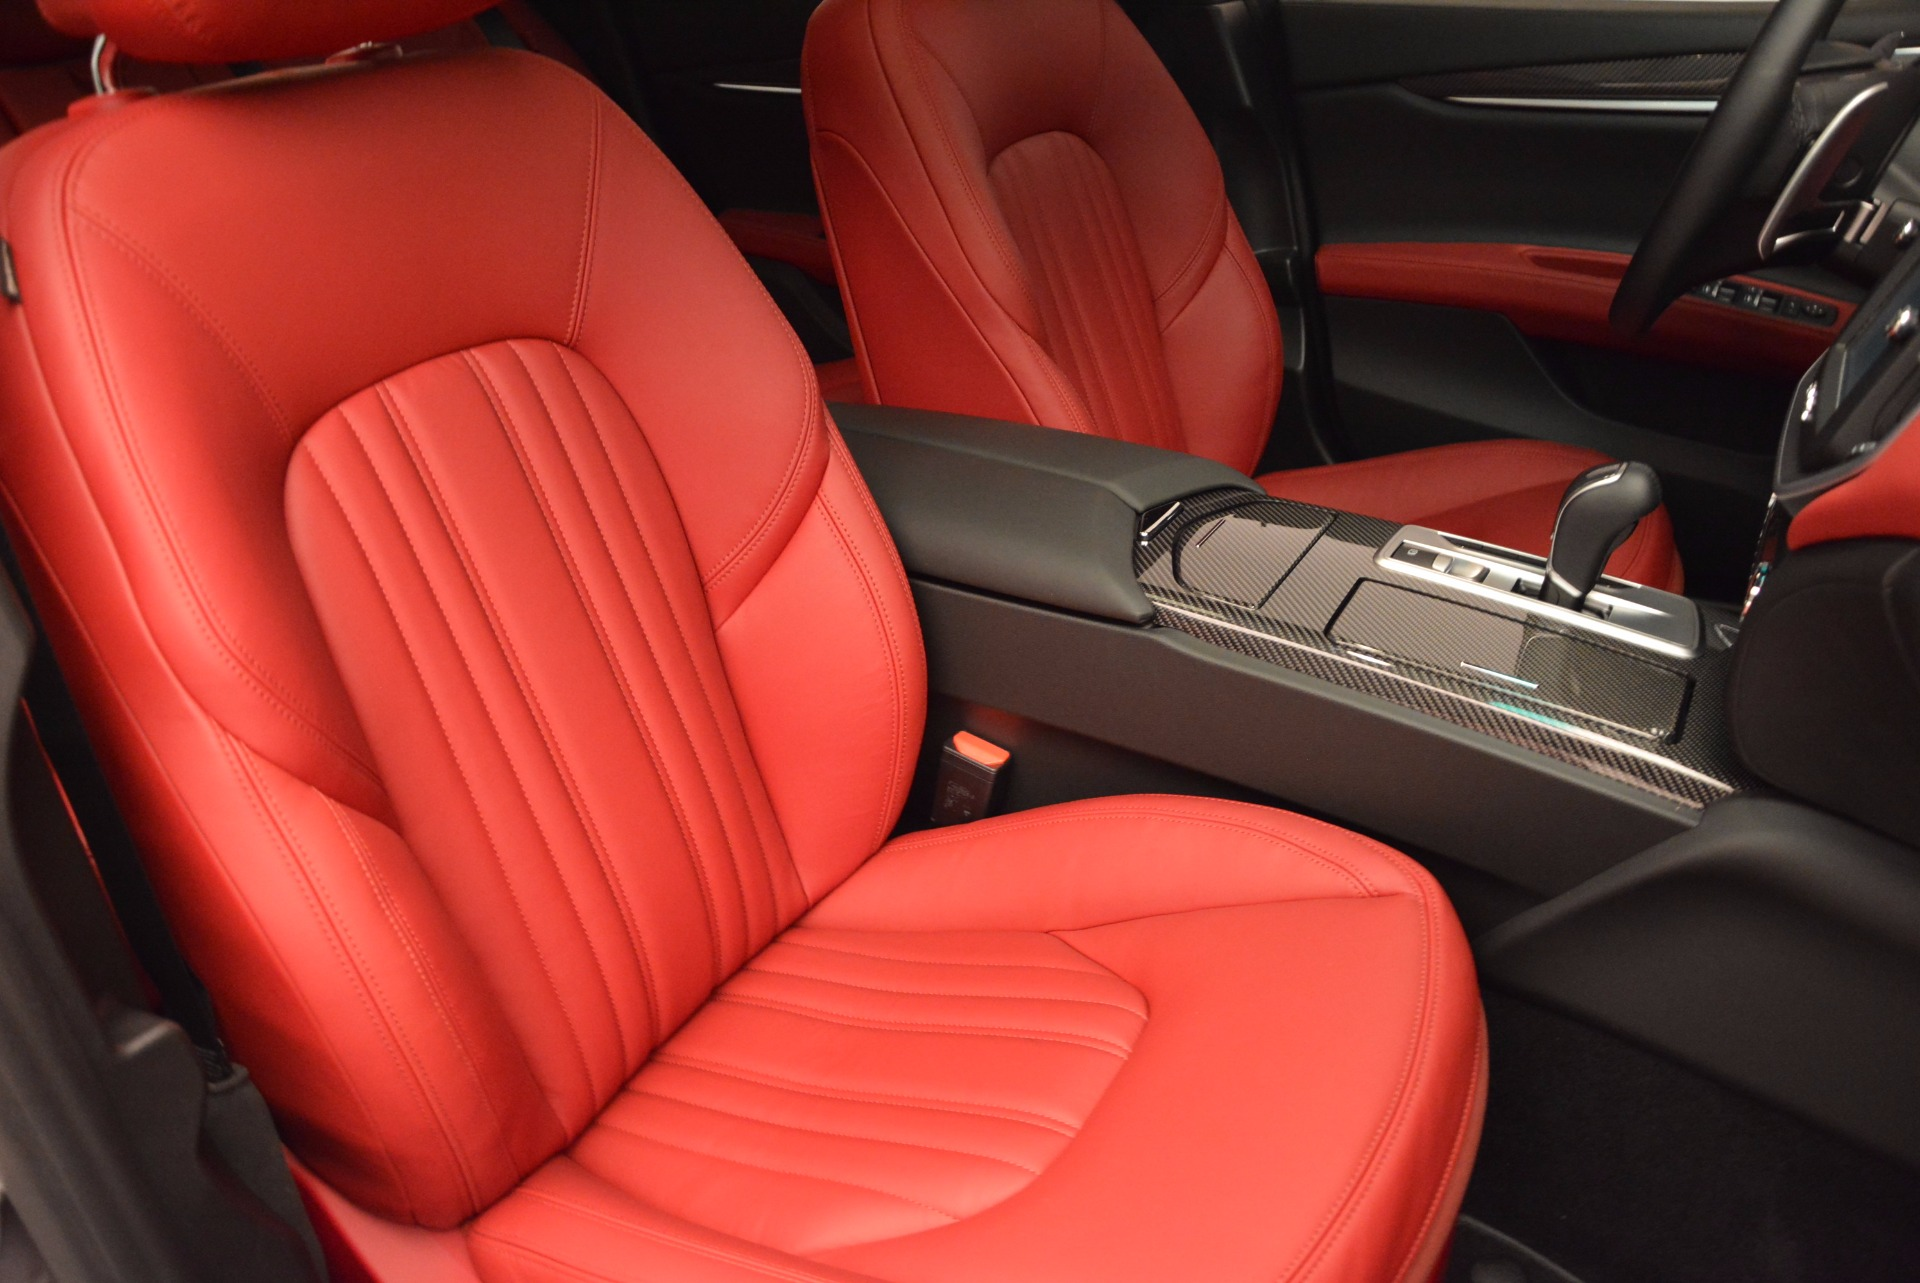 Used 2015 Maserati Ghibli S Q4 For Sale In Westport, CT 1290_p22